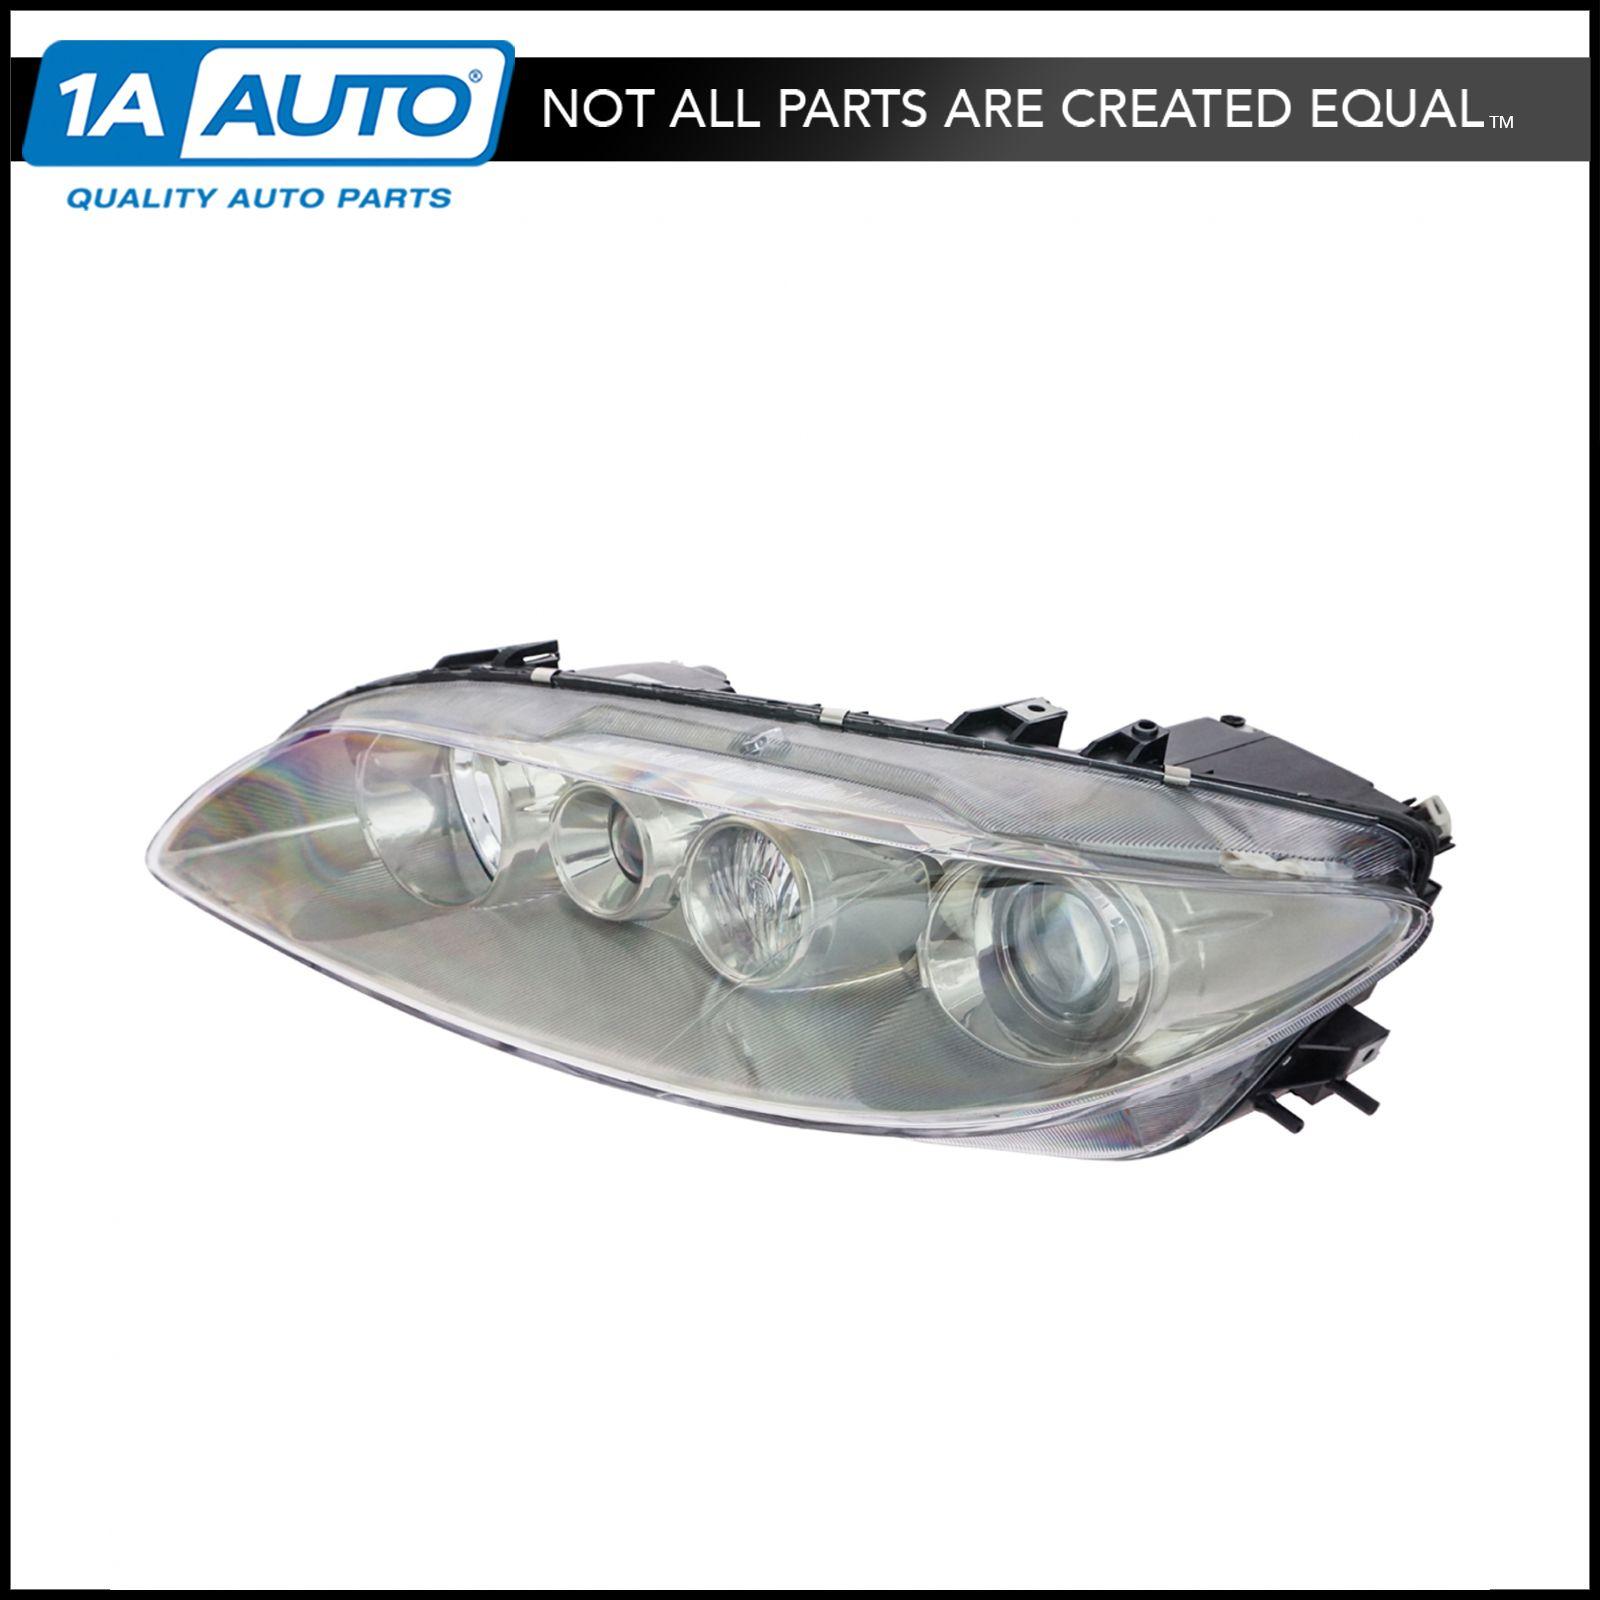 2004 Mazda 6 Headlight Bulb